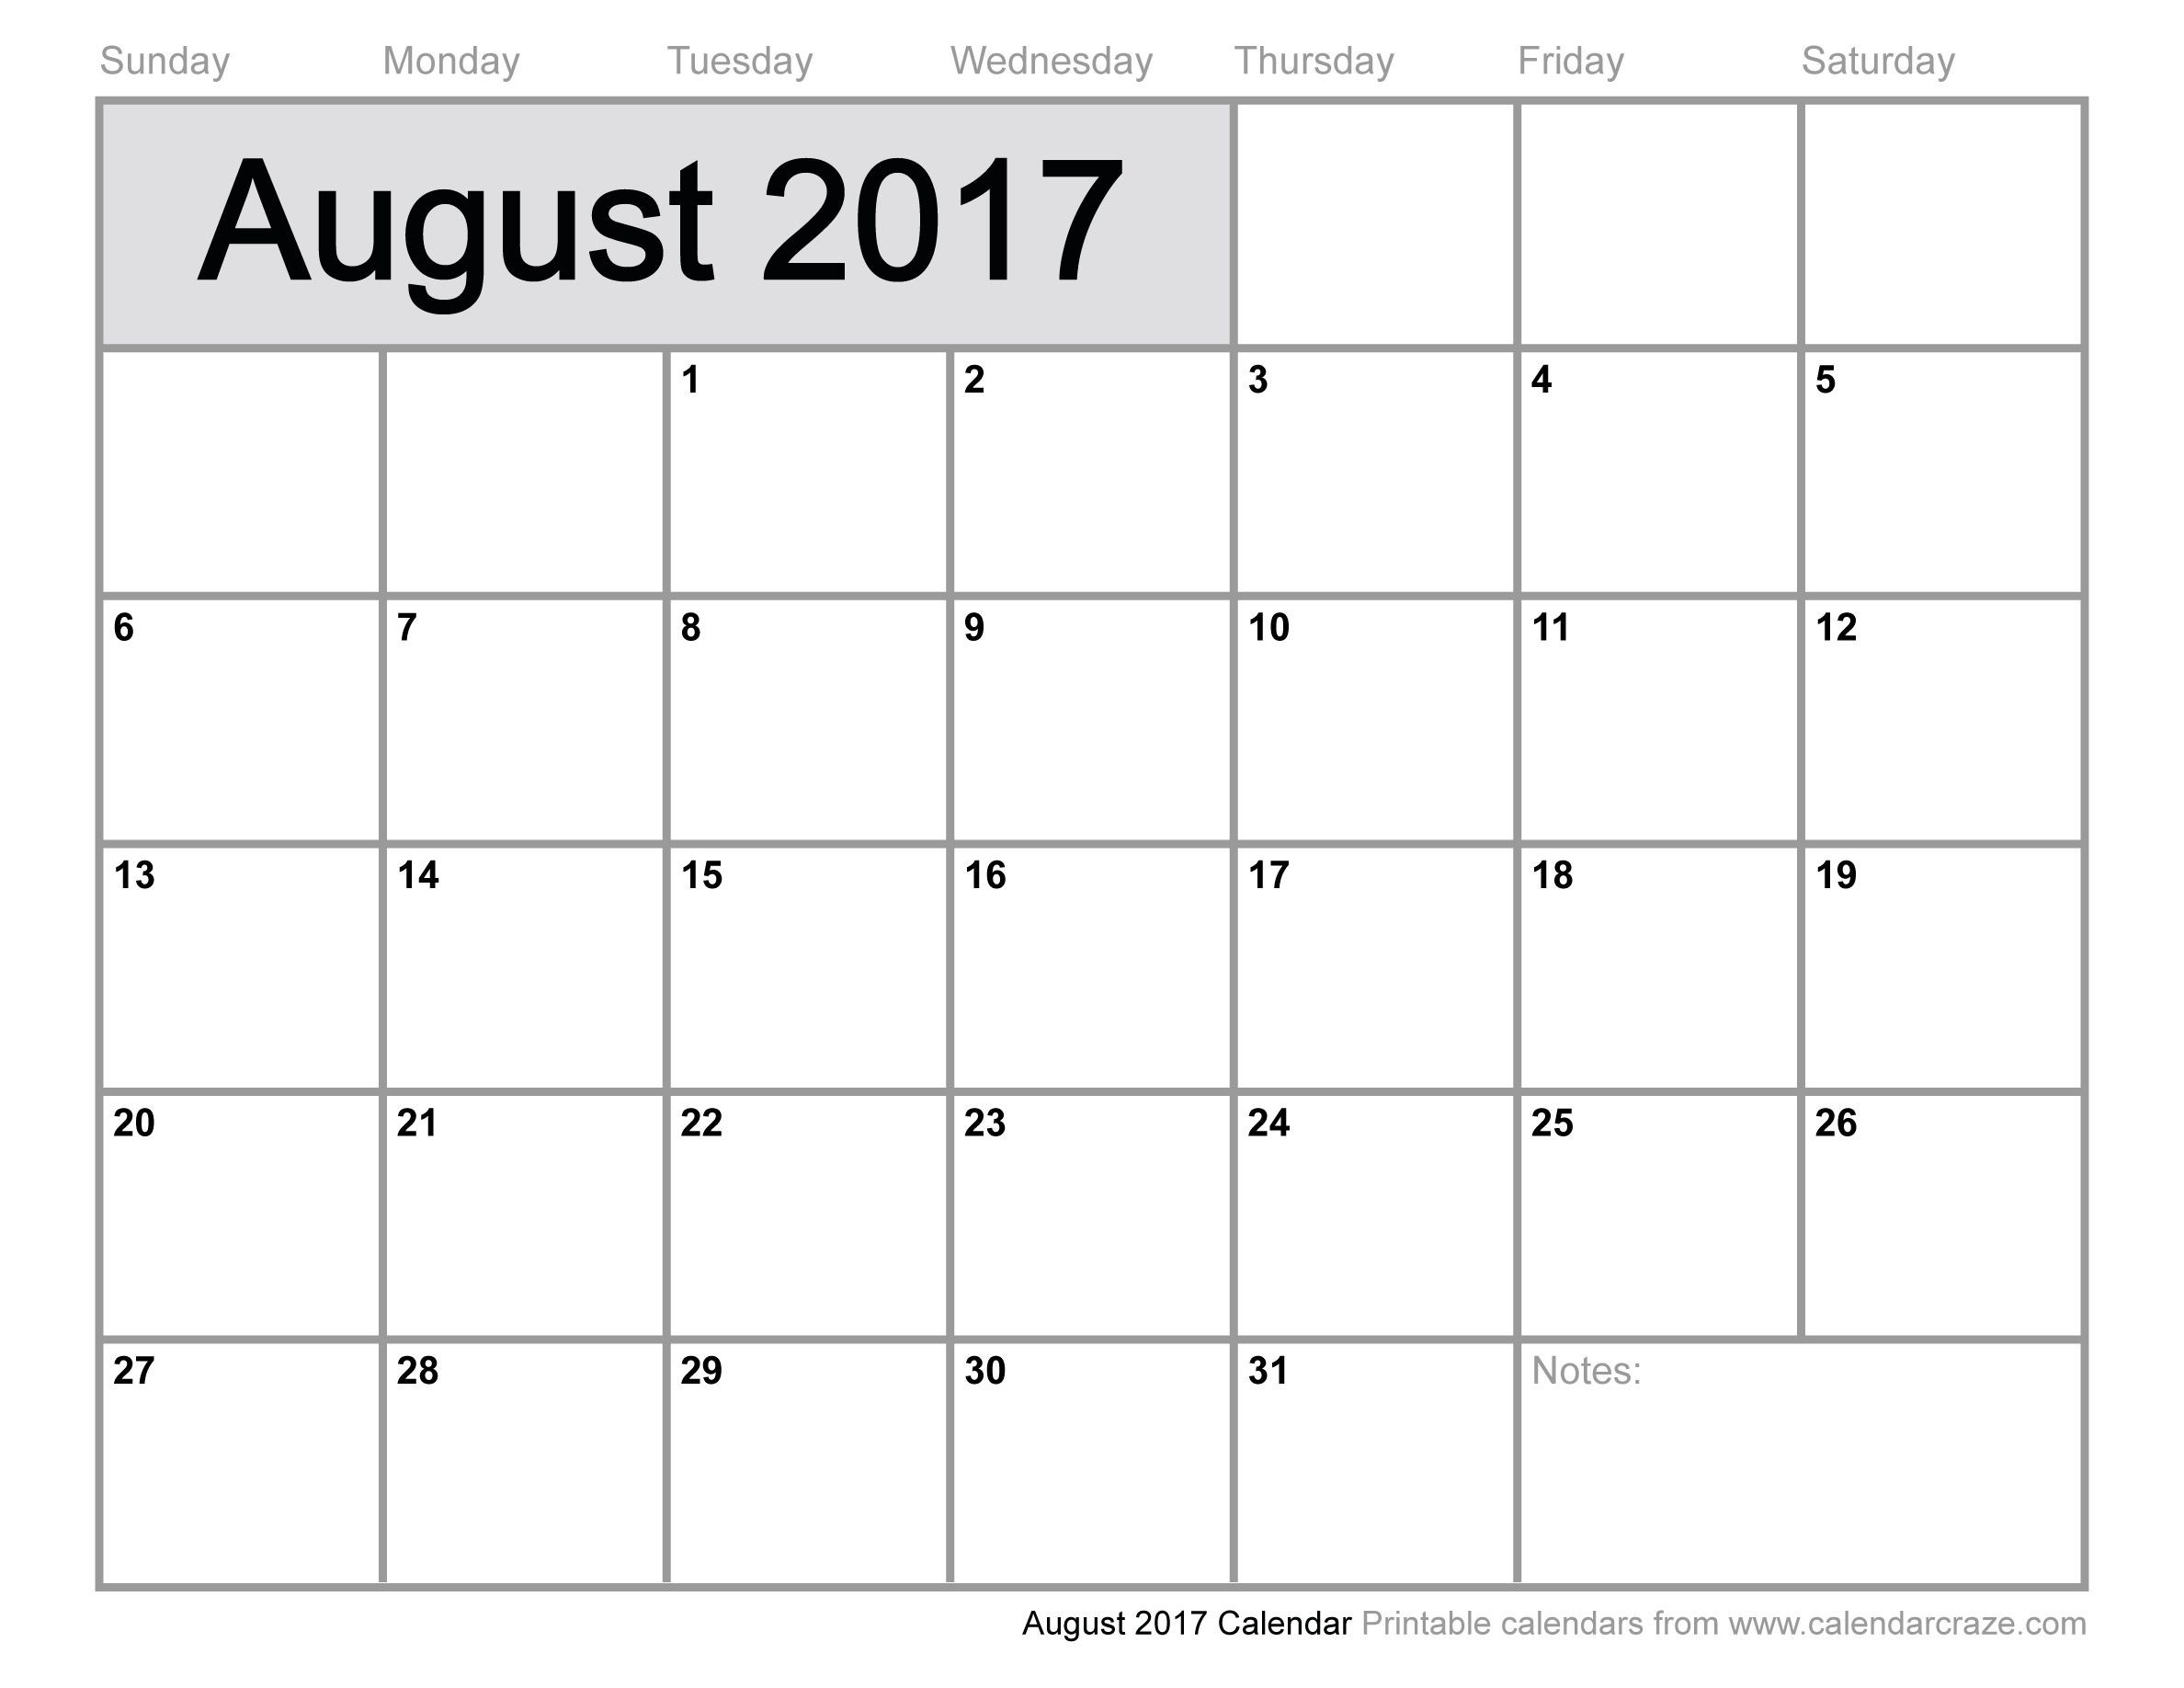 August 2017 Calendar Uk, August 2017 Uk Calendar, August-Uk Monthly Calendar Template